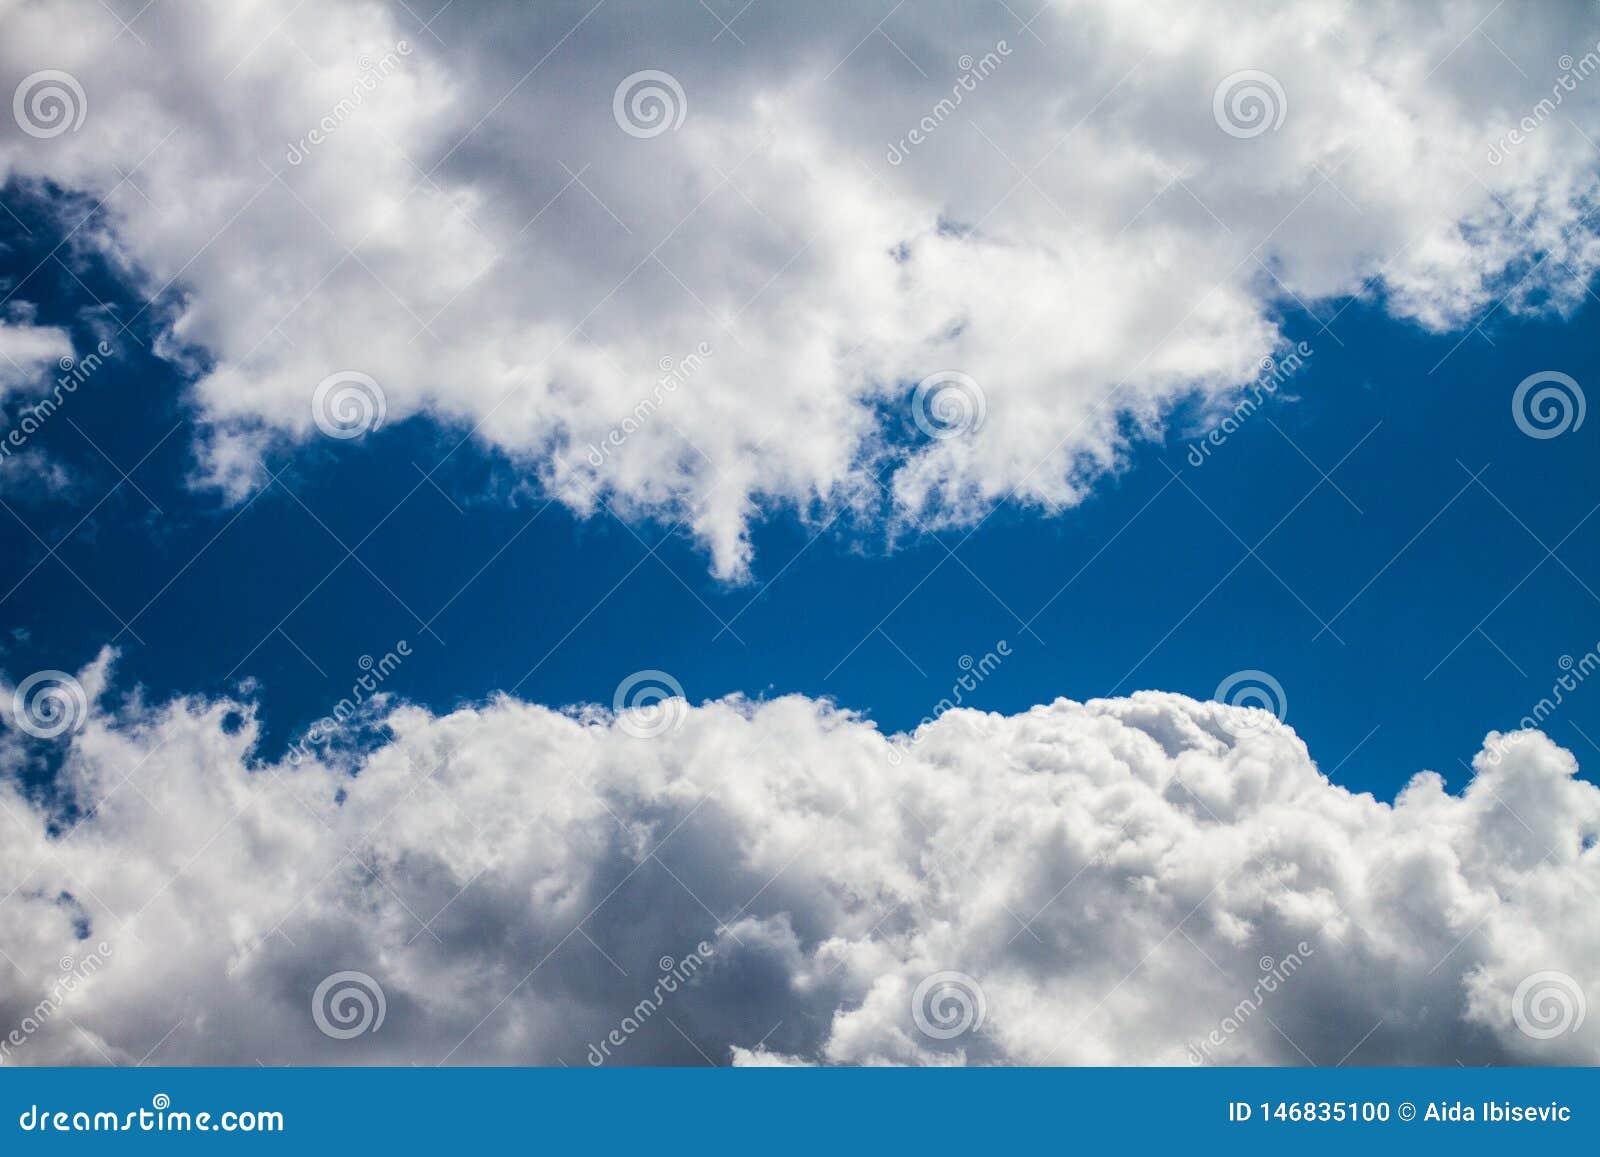 Nuvole di Celestial Navy Blue Sky With